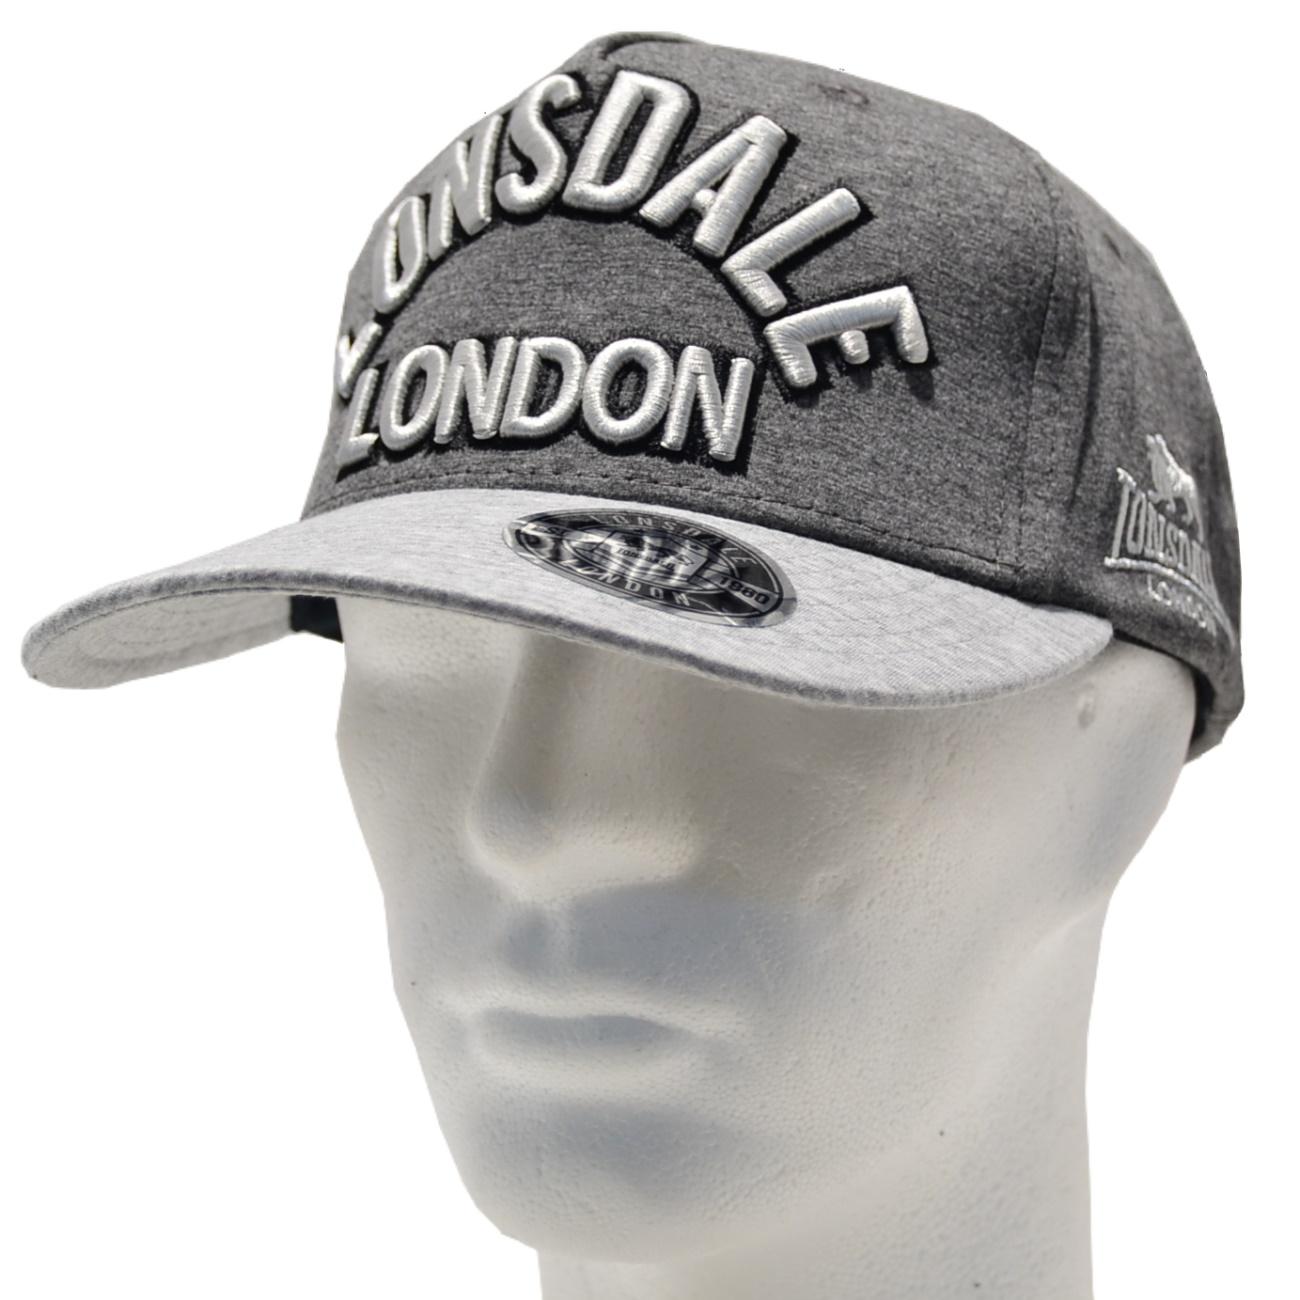 Lonsdale London Basecap mit grossem Logo